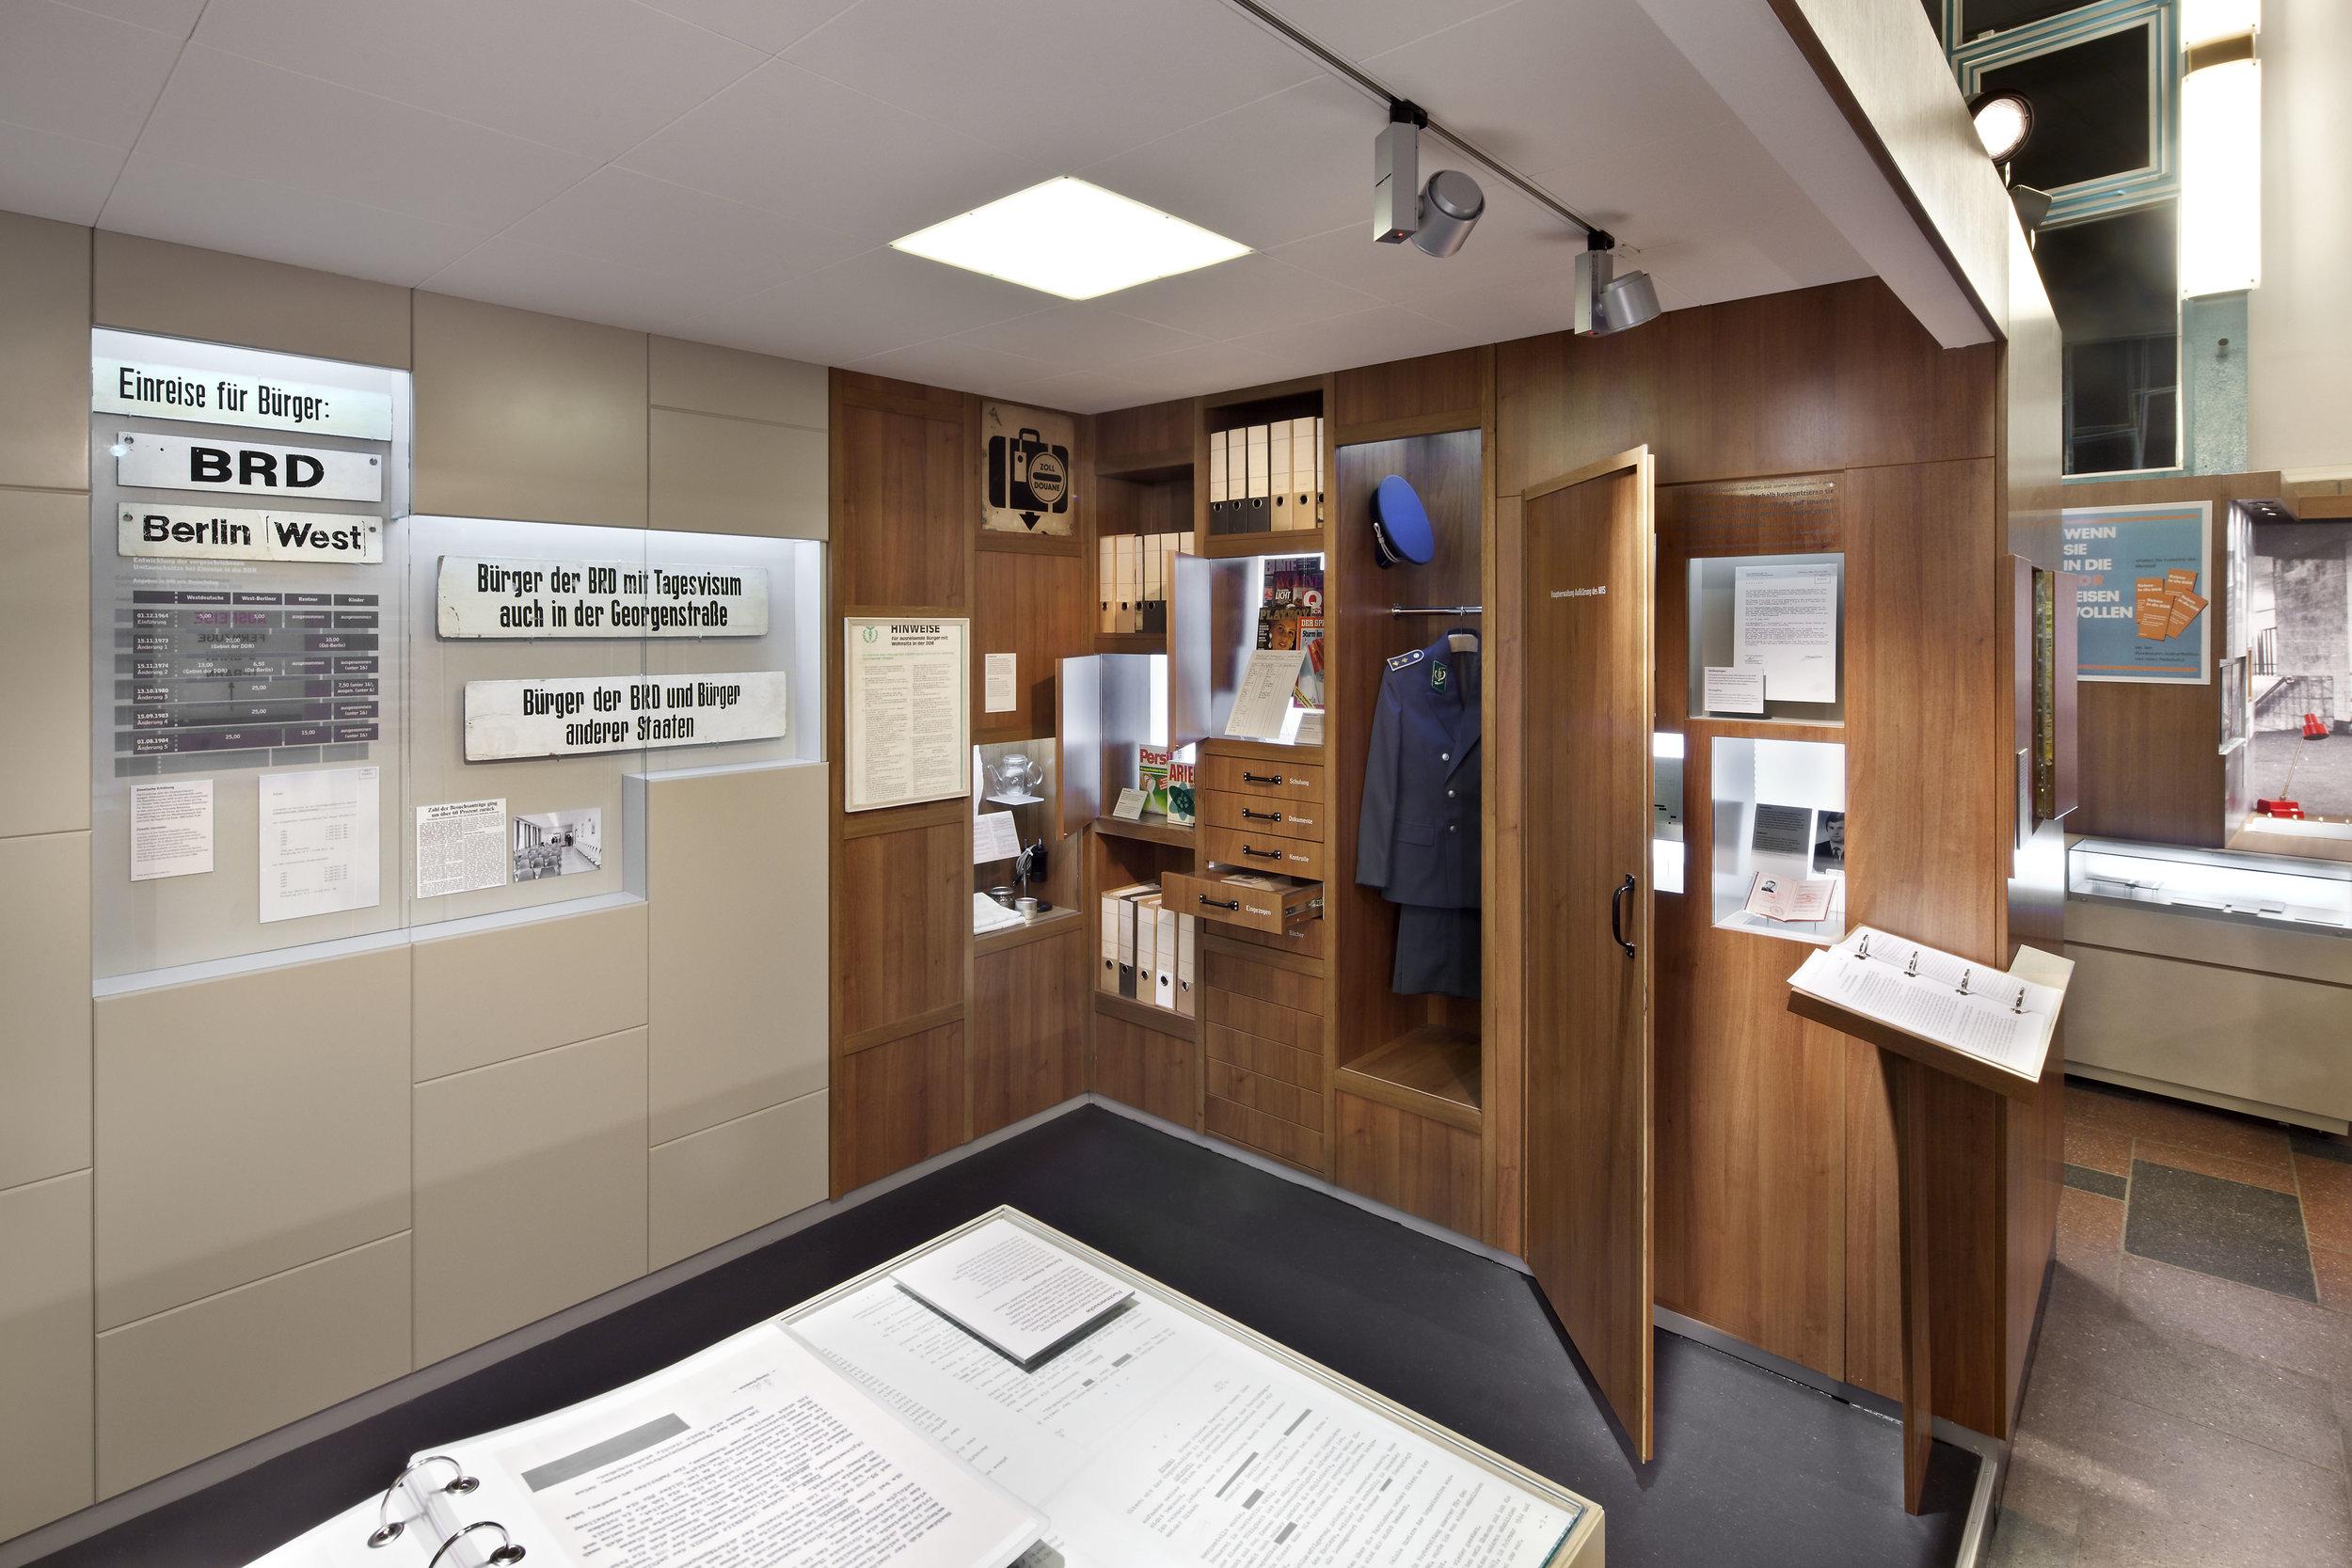 traenenpalast_museum-exhibition-design_coordination-berlin_07.jpg